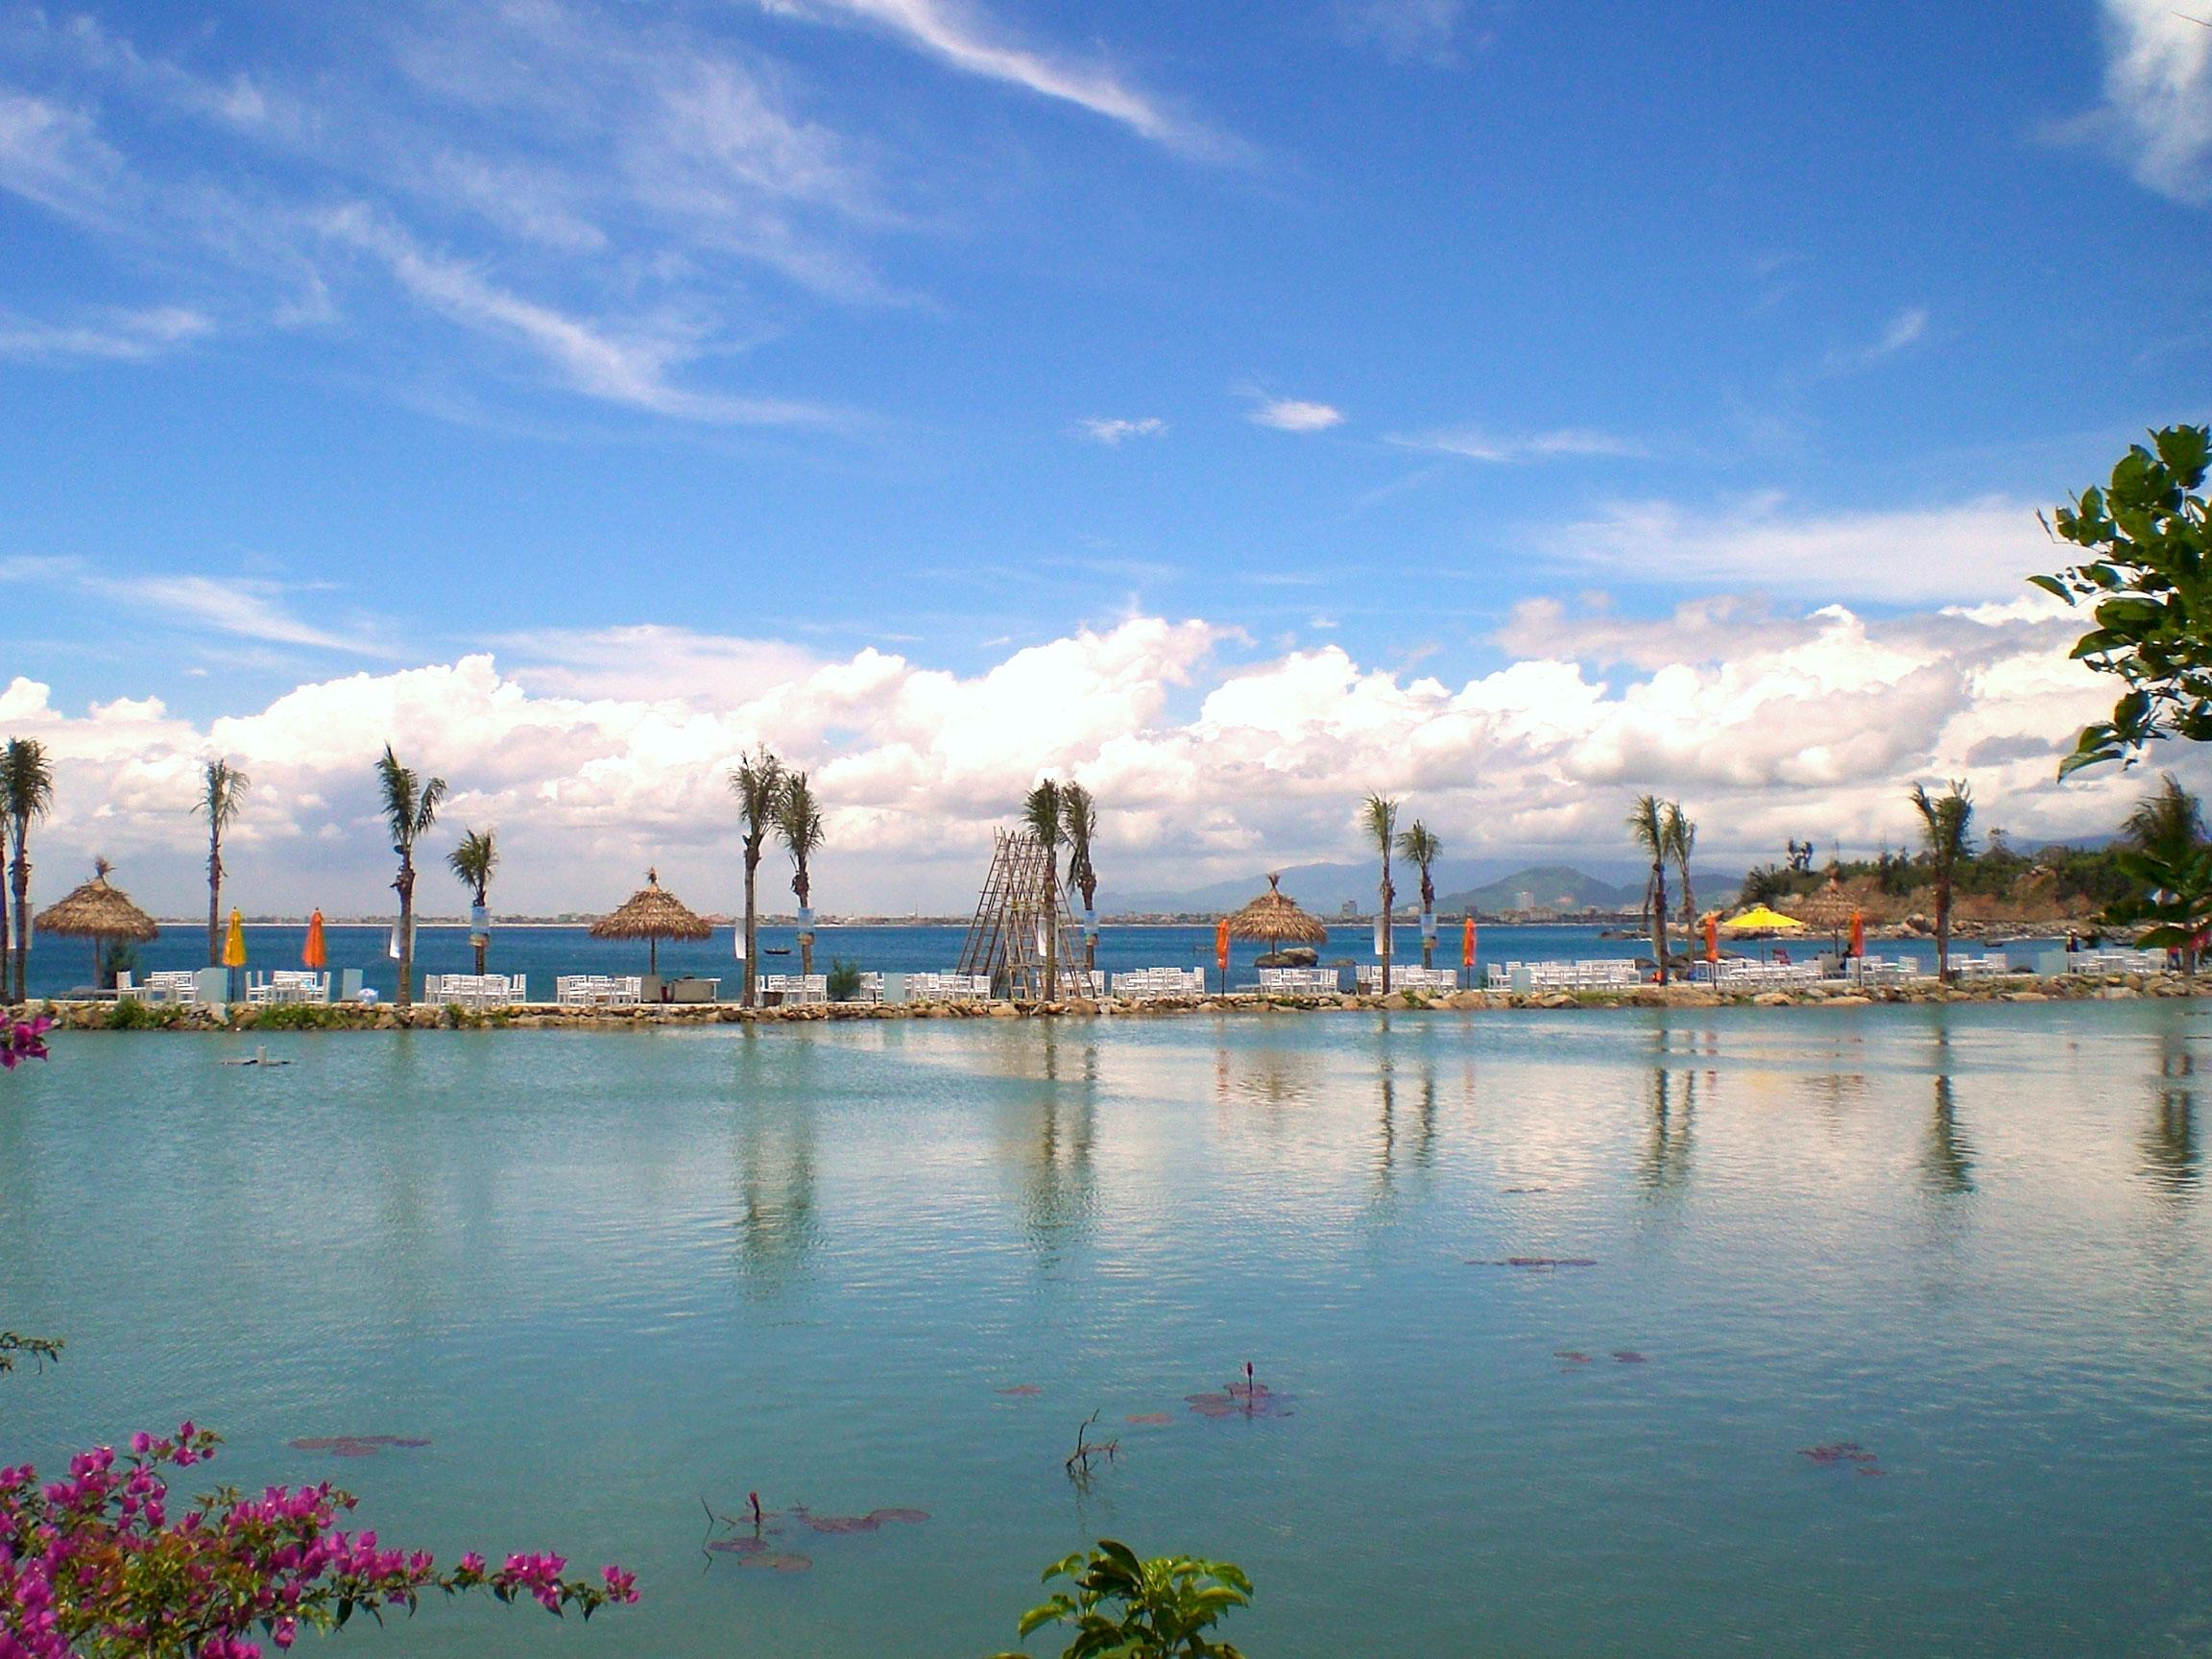 Da Nang Vietnam  City pictures : Description Bai but Resort, Da Nang, Vietnam